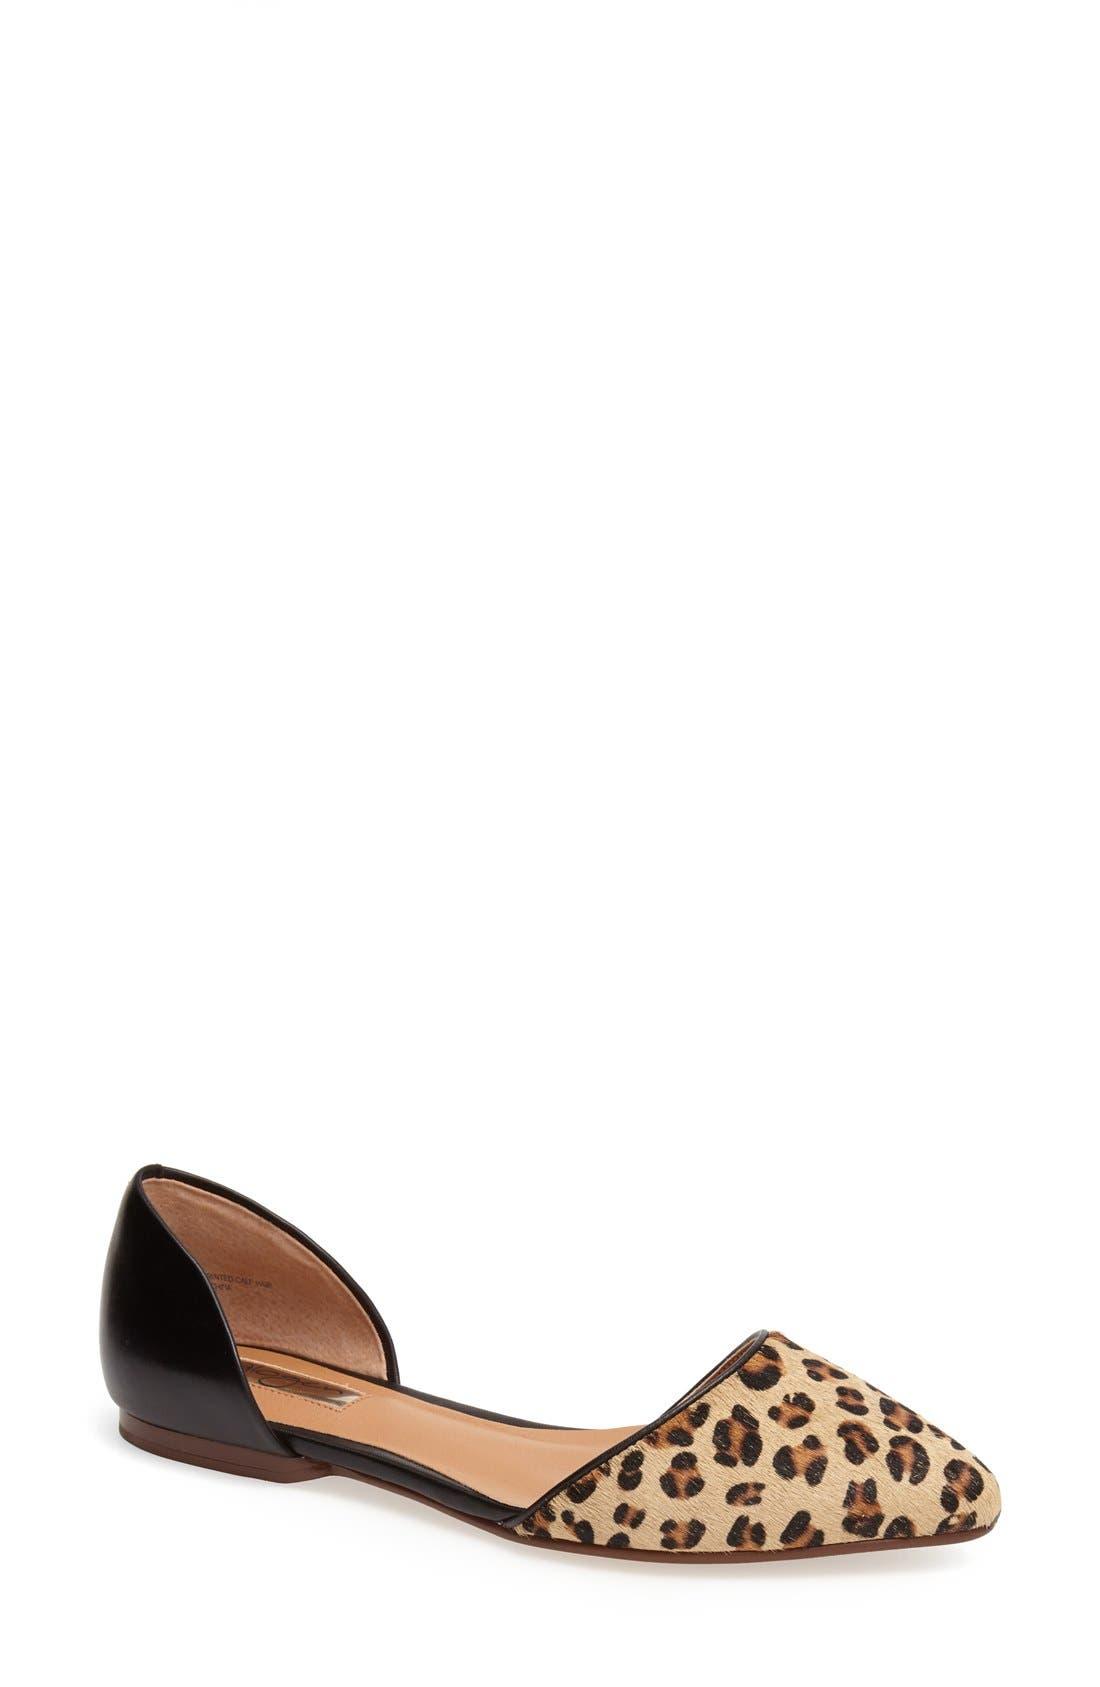 'Kayla' Leather & Calf Hair Pointy Toe Flat, Main, color, 240